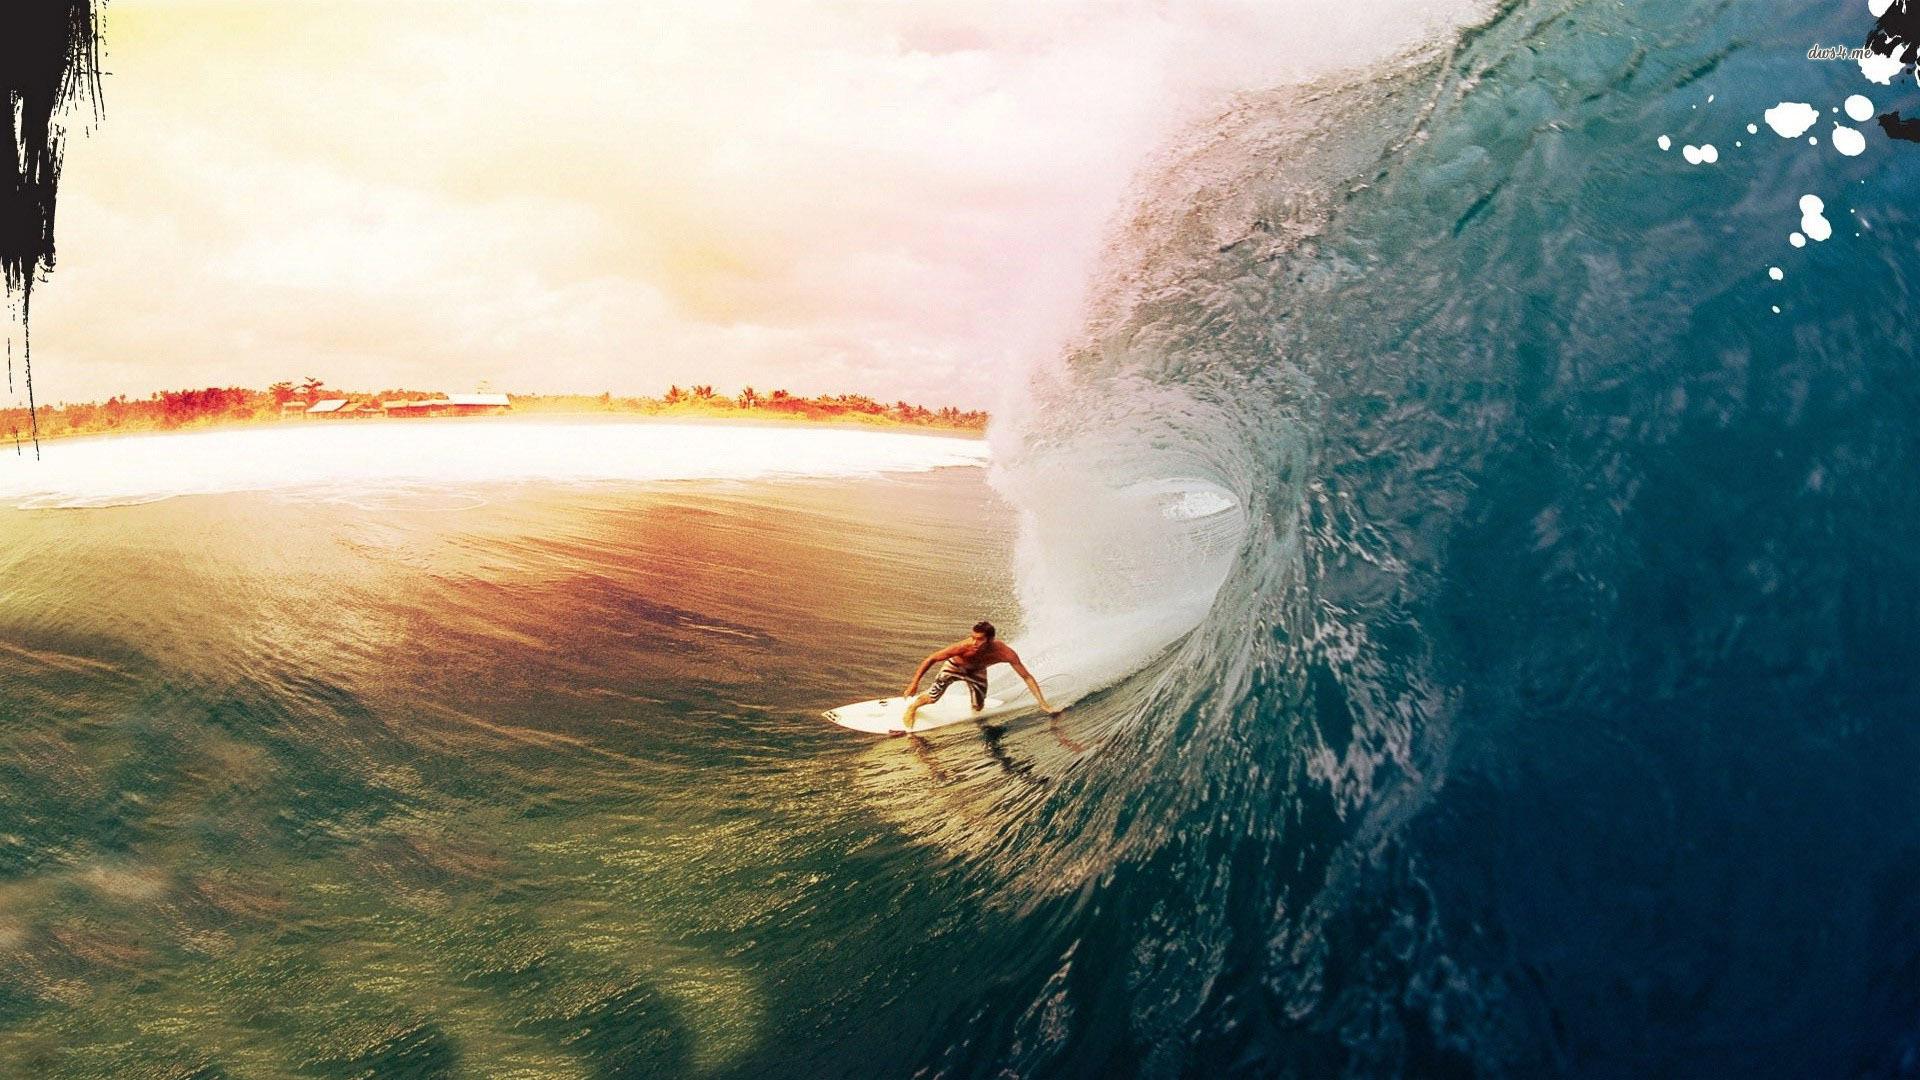 Surfer Wallpaper - MixHD wallpapers